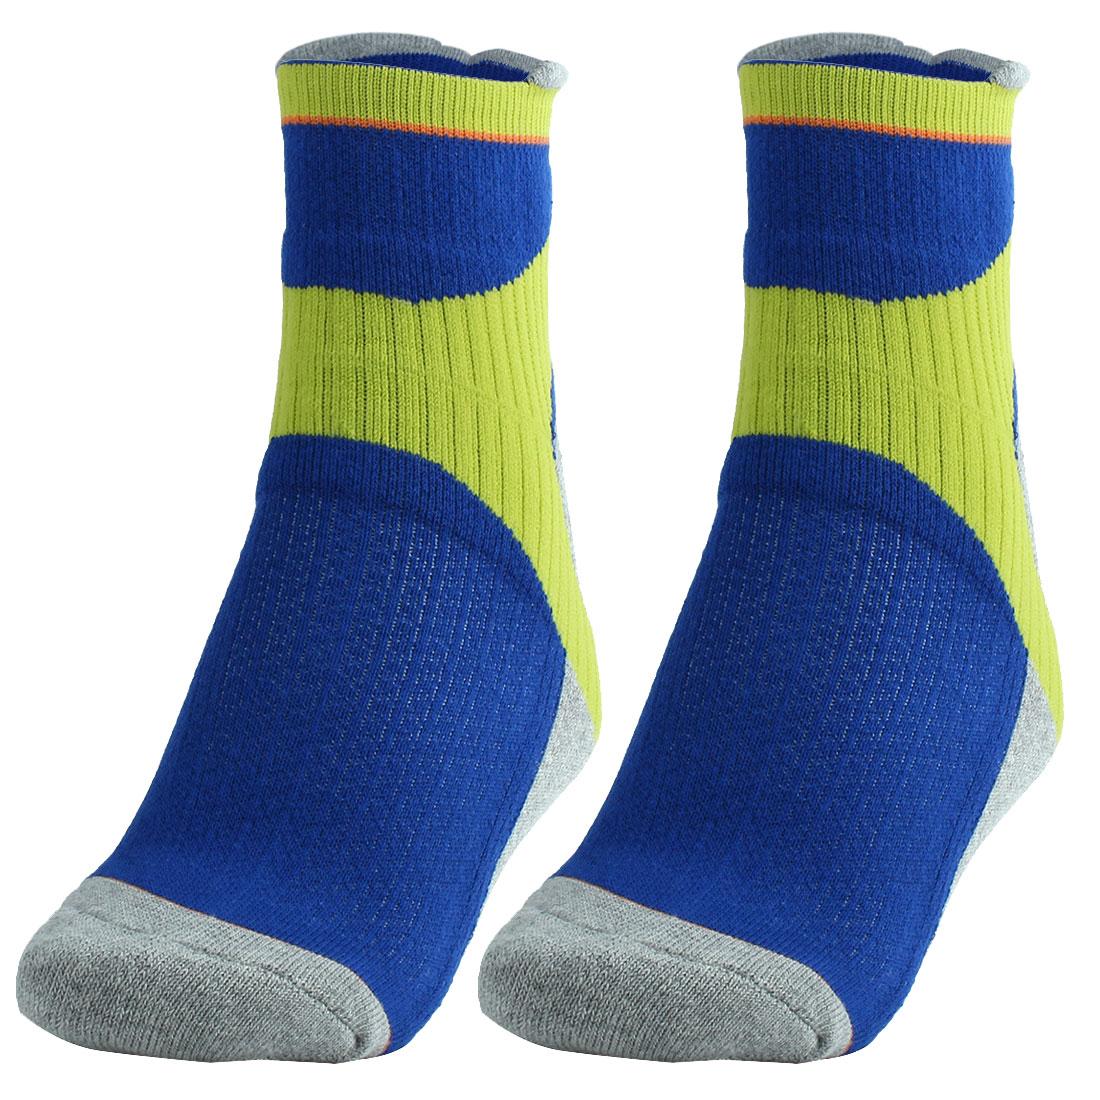 R-BAO Authorized Adult Badminton Sports Mountain Bike Cycling Socks Blue Pair